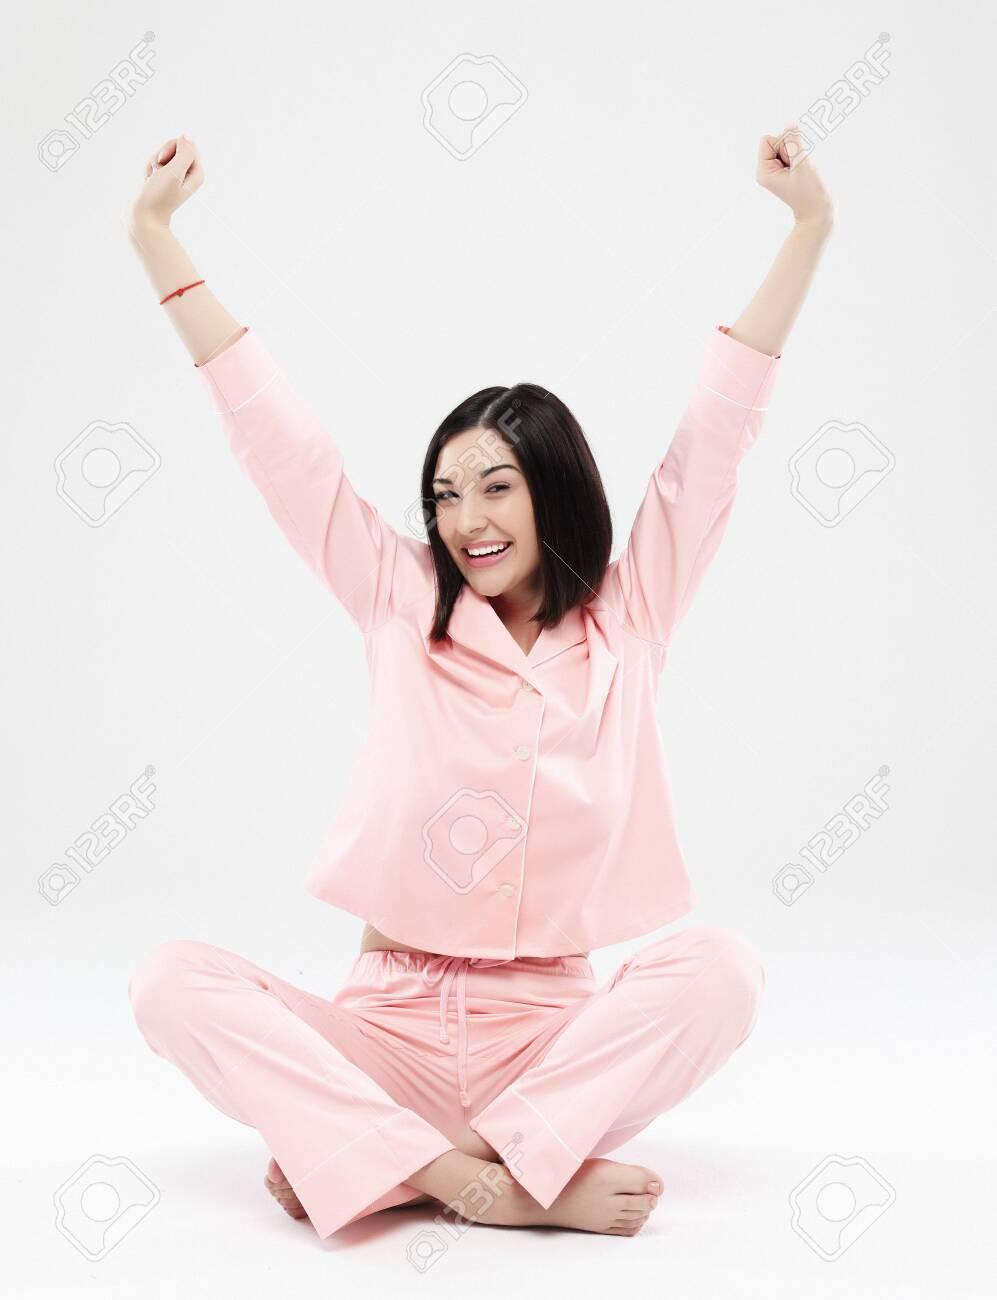 beautiful brunette woman dressed in pink pajamas sitting on the floor - 127802097